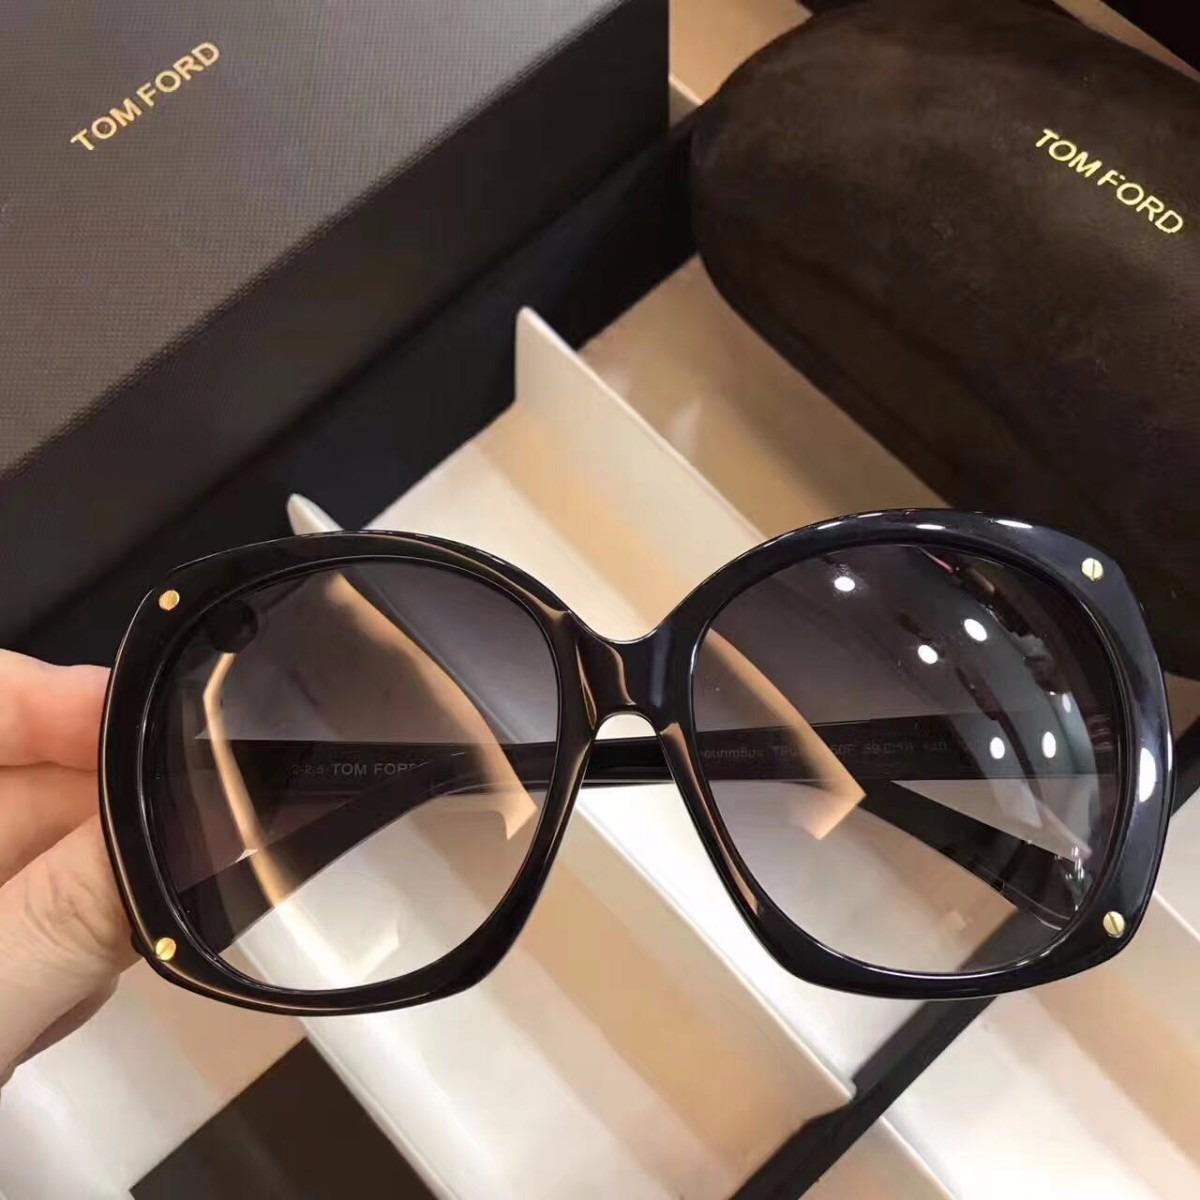 Óculos Sol Tom Ford Geométrica Feminino Frete Grátis - R  399,00 em ... 21c551f424